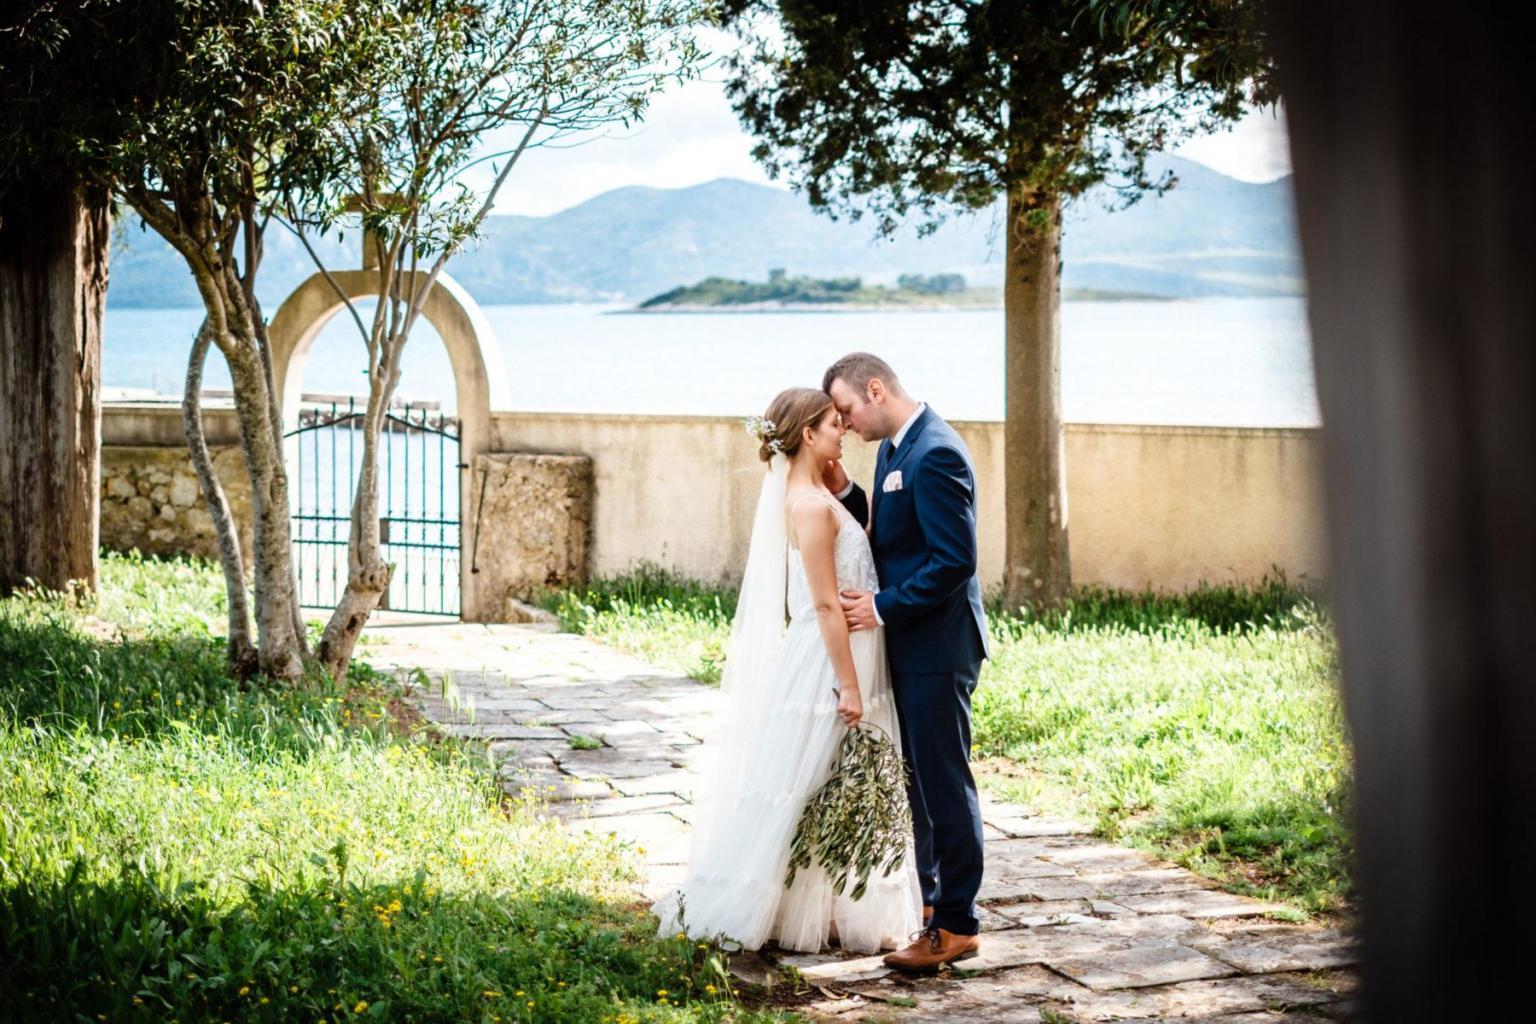 Nathalie Fabian in Kroatien 0021 scaled - Game of Thrones Hochzeit in Kroatien